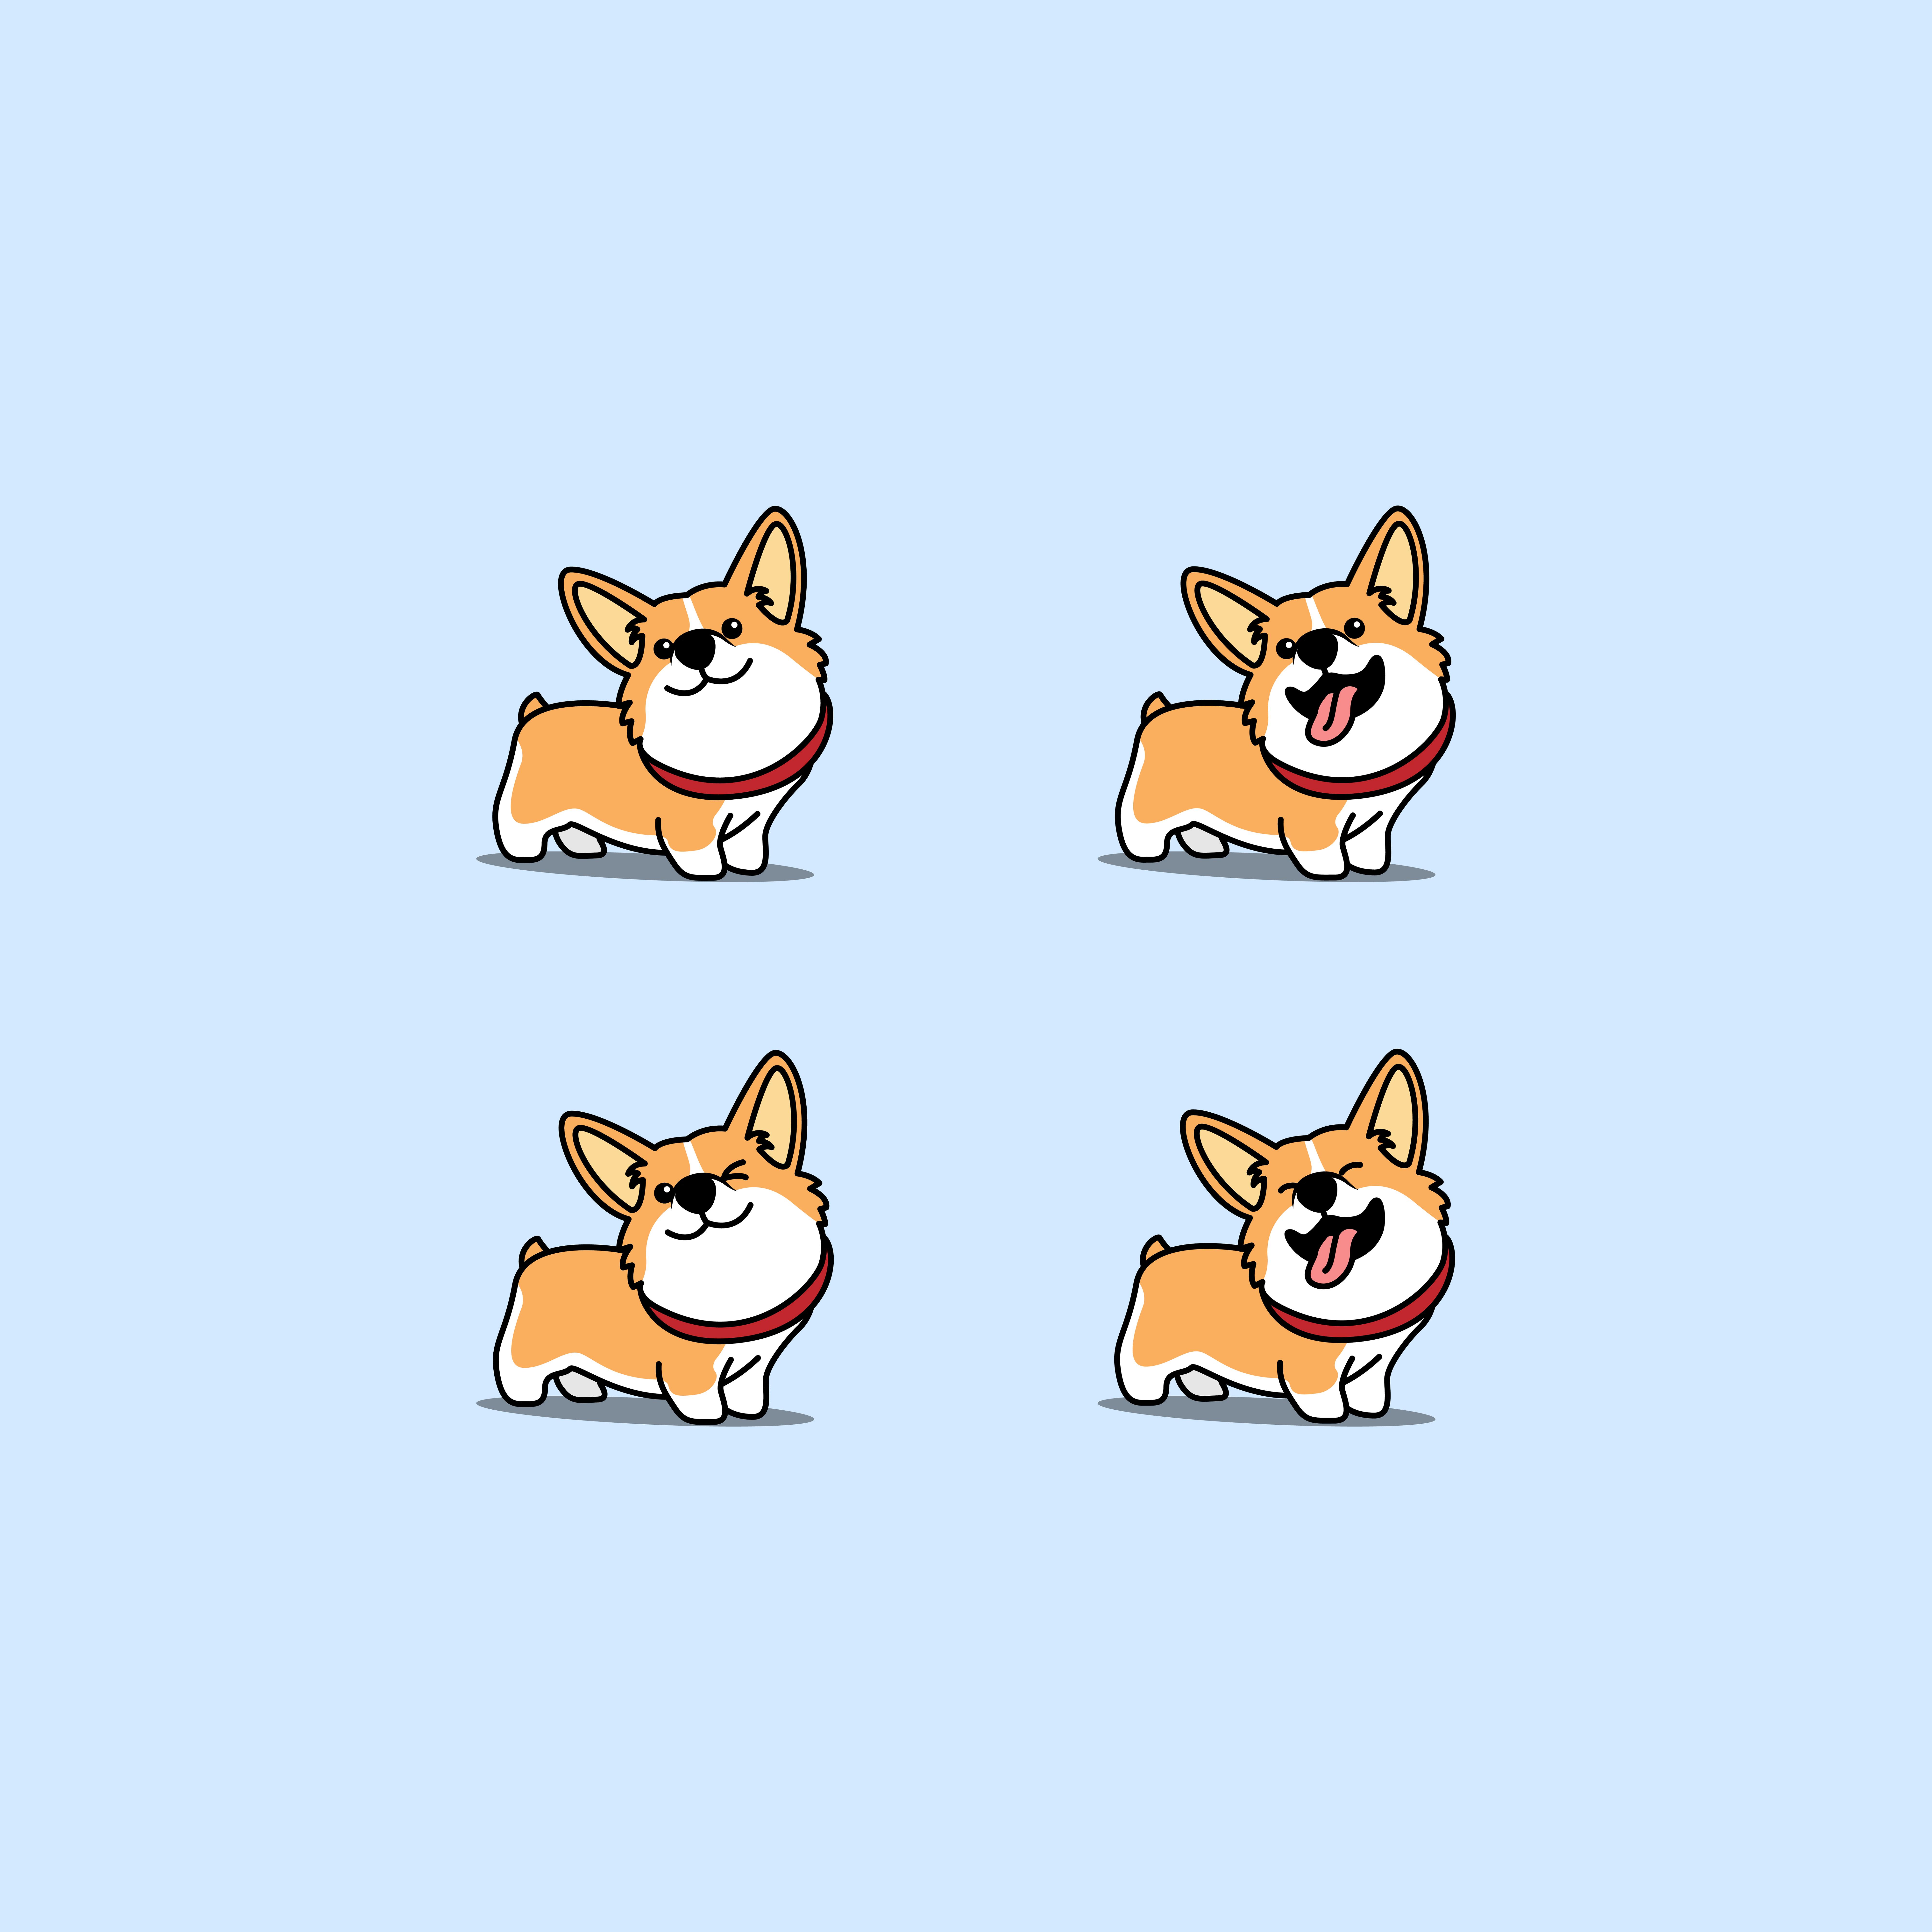 Cute Welsh Corgi Dog Cartoon Set Download Free Vectors Clipart Graphics Vector Art Том кортнэй, джон калшо, кулвиндер гир и др. vecteezy